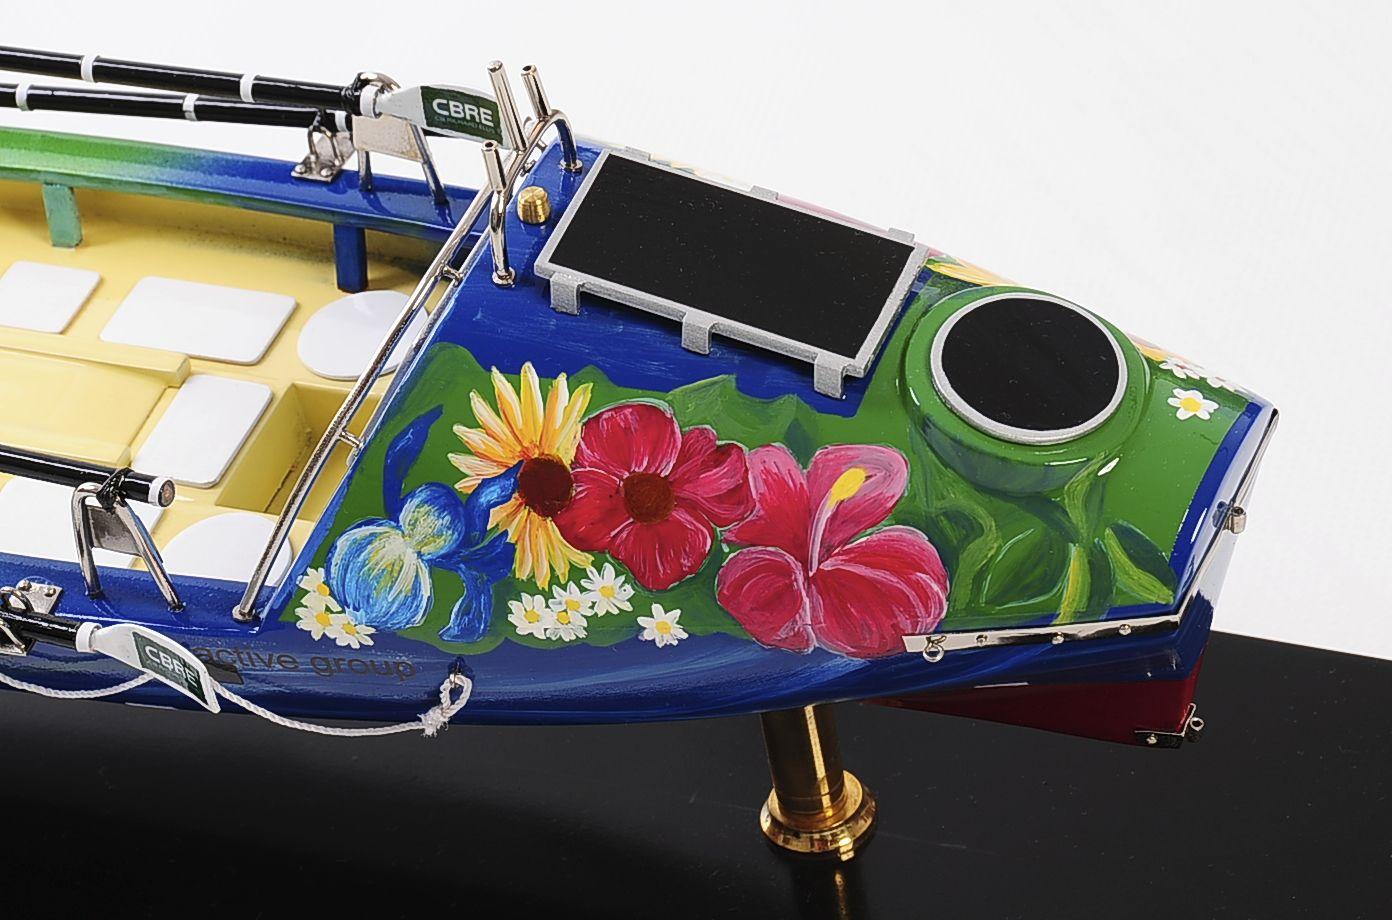 1389-8744-Ocean-Rowing-Boat-Model